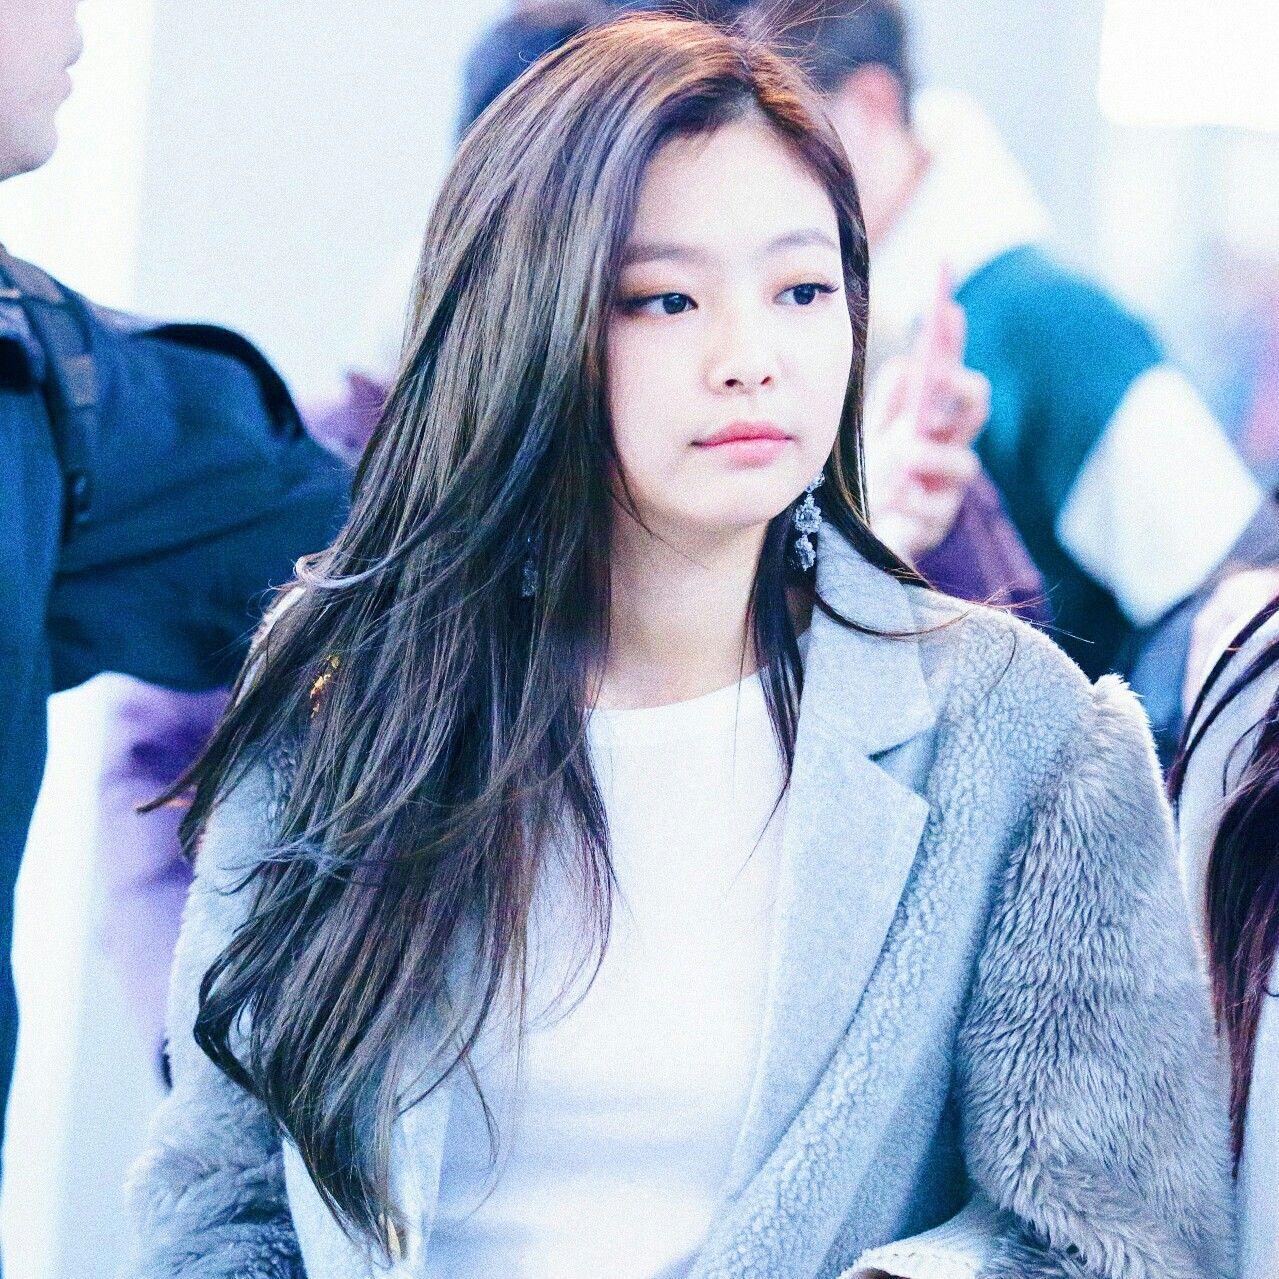 Kimjennie Jennie Kpop Idols Blackpink Ygent Blink Jen Visual Blackpink Jennie Kim Jennie Korean Girl Groups